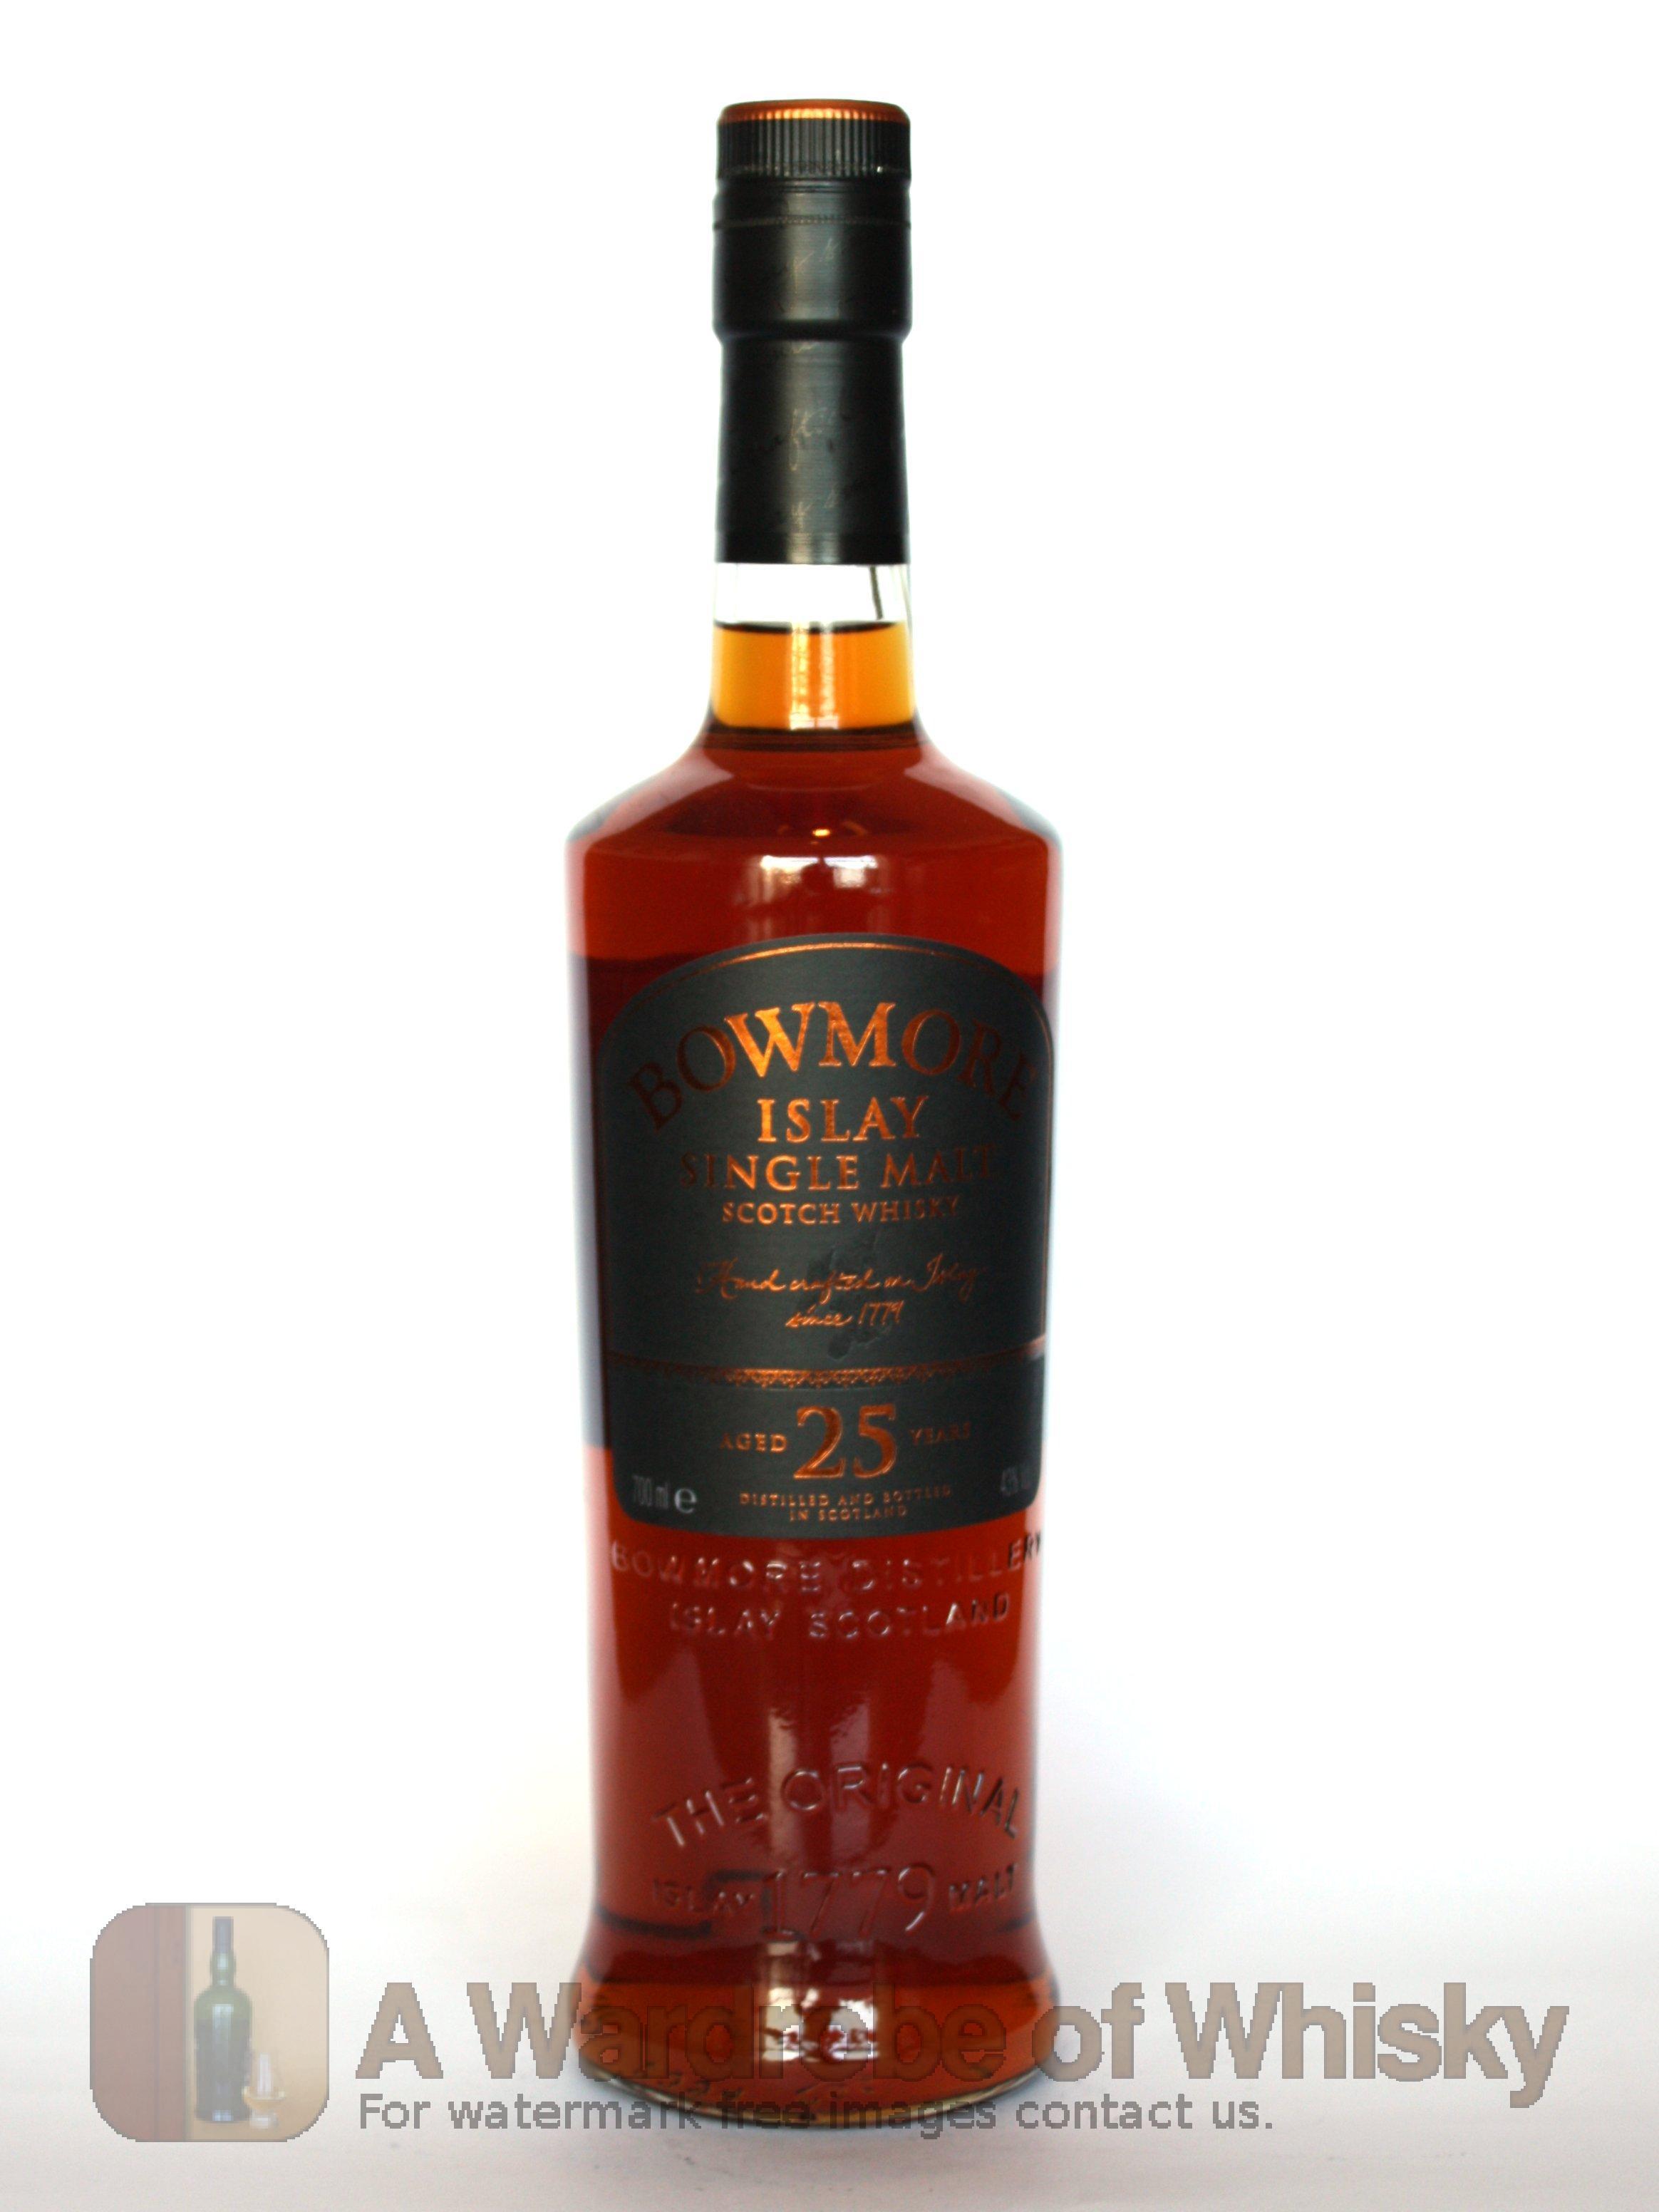 Best 25 Year Round Flowers Ideas On Pinterest: Buy Bowmore 25 Year Single Malt Whisky - Bowmore